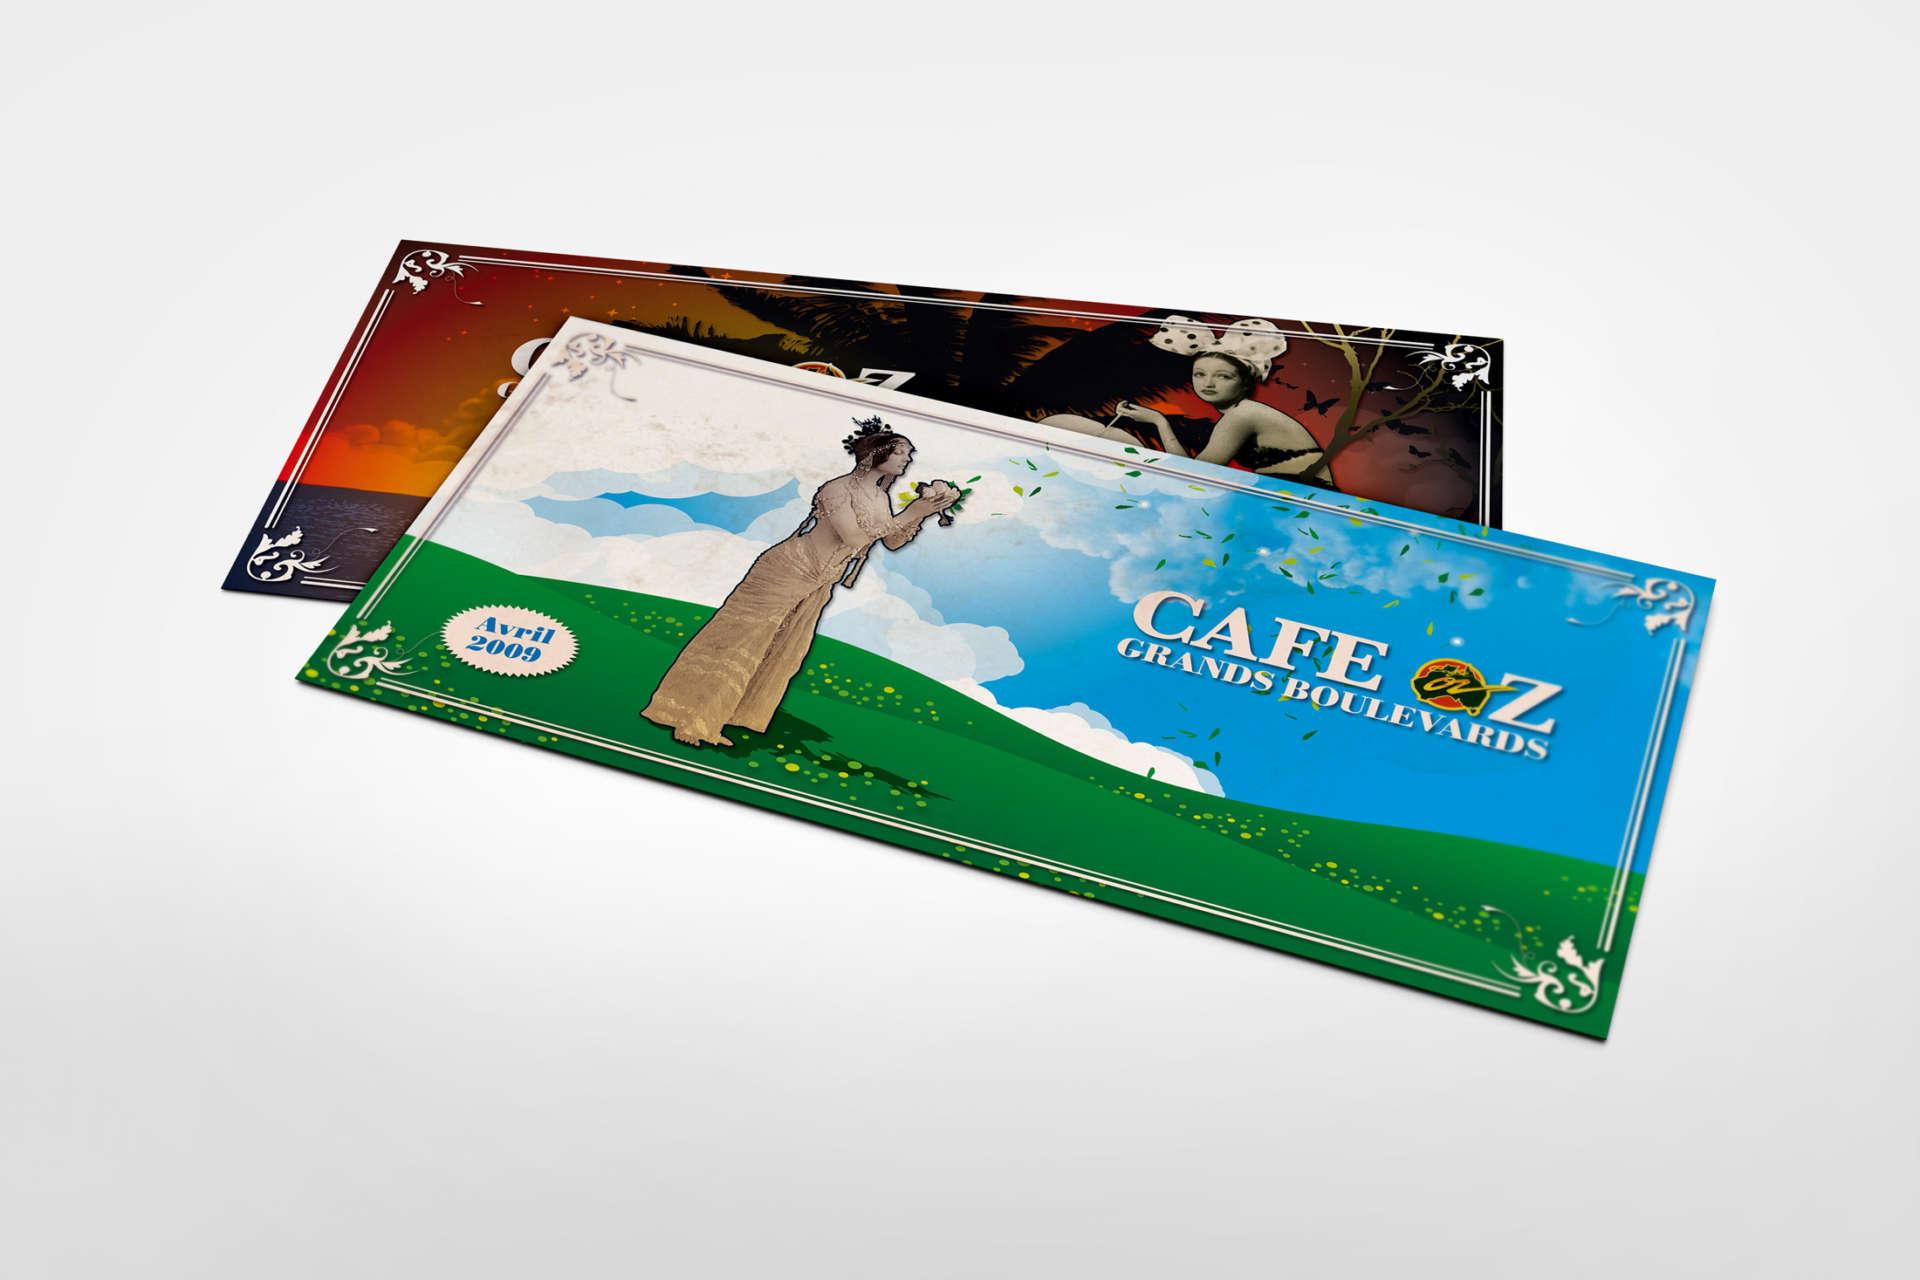 CafeOz-GdBd-04